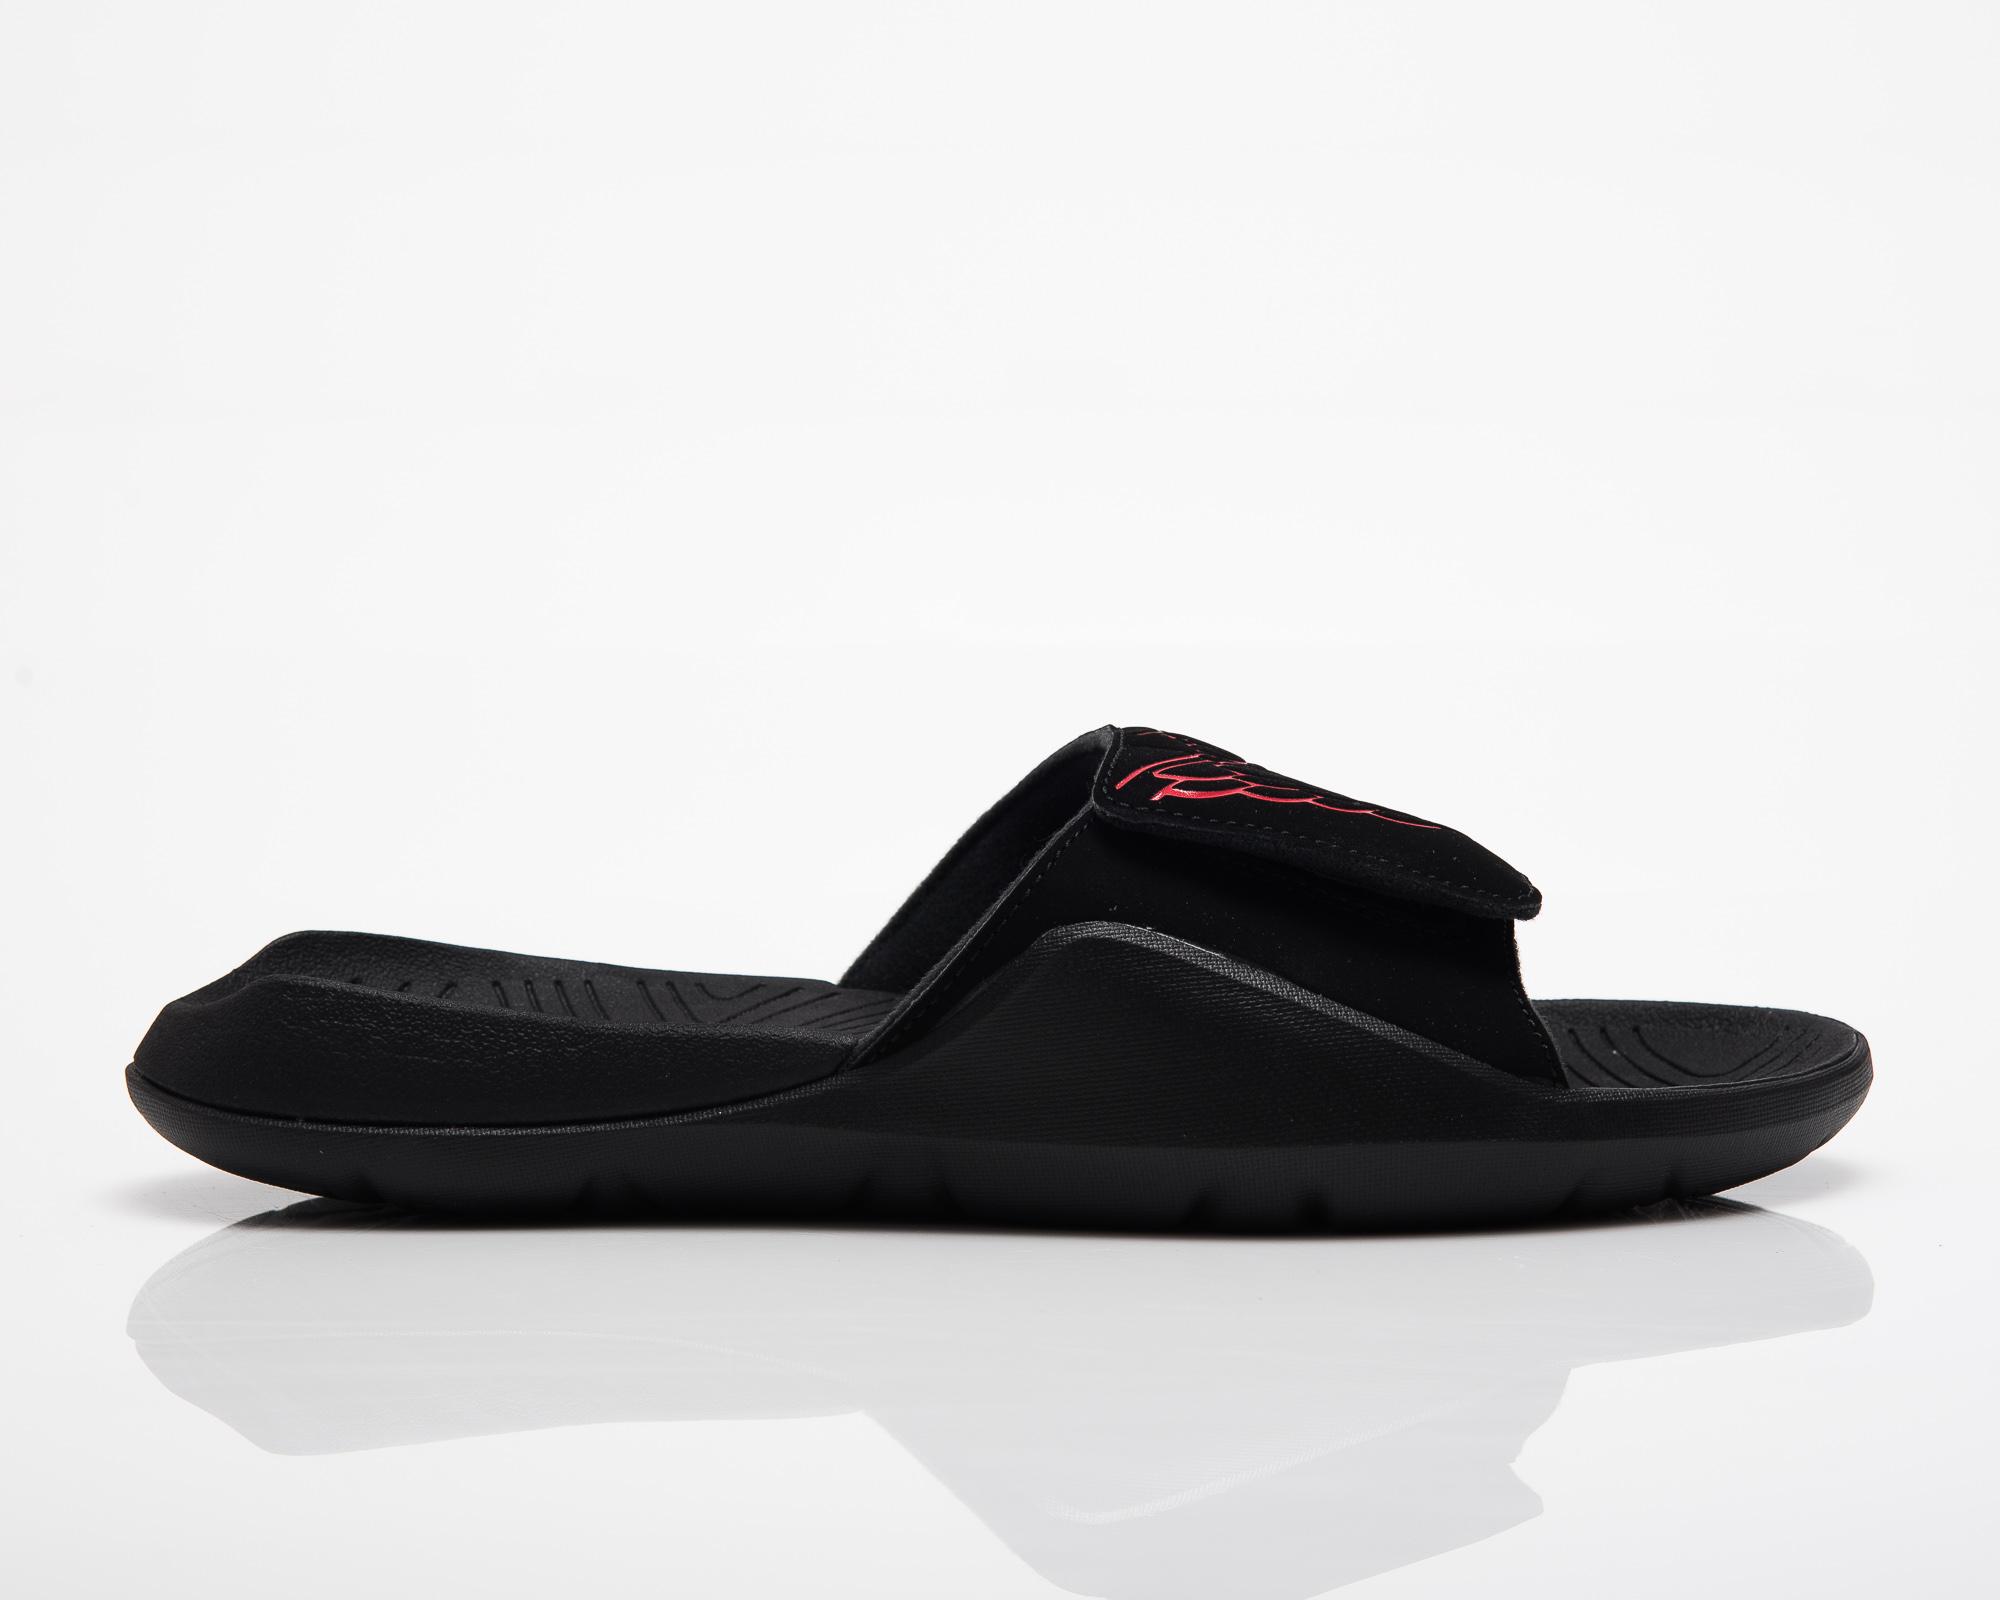 d55d6ca976bffb Jordan Hydro 7 - Shoes Slides - Sporting goods